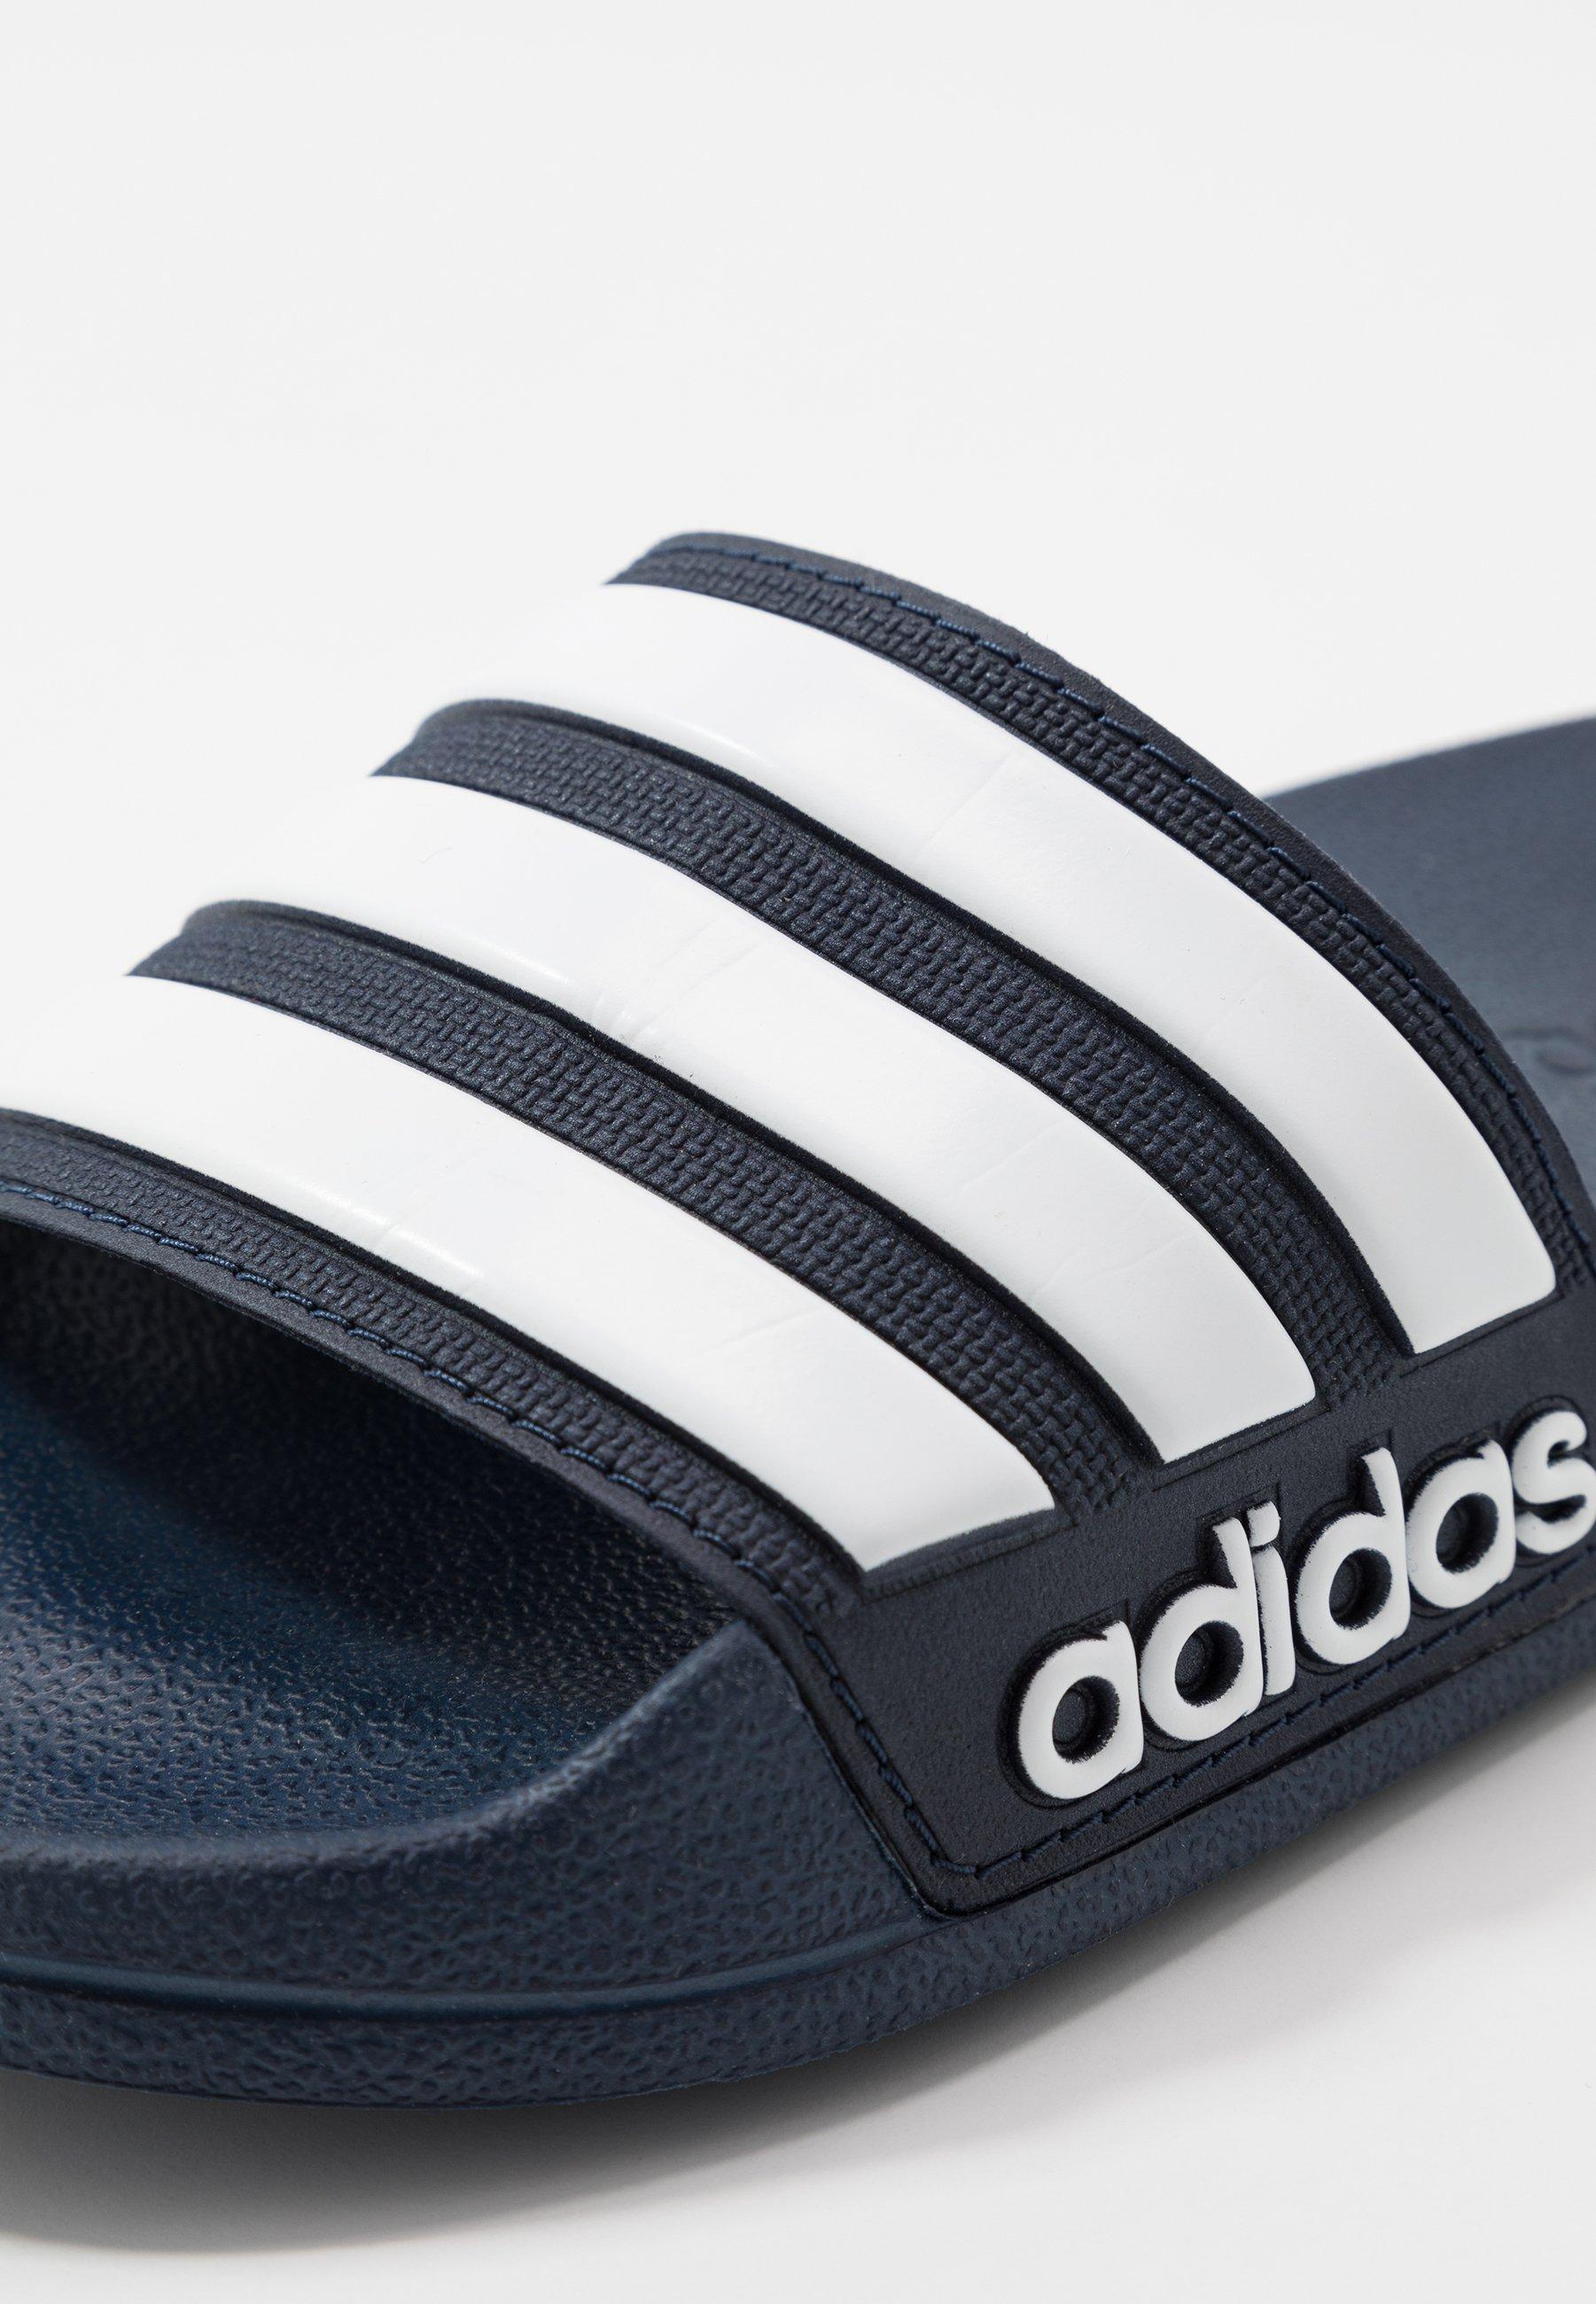 Adidas Performance Adilette - Badsandaler Blue